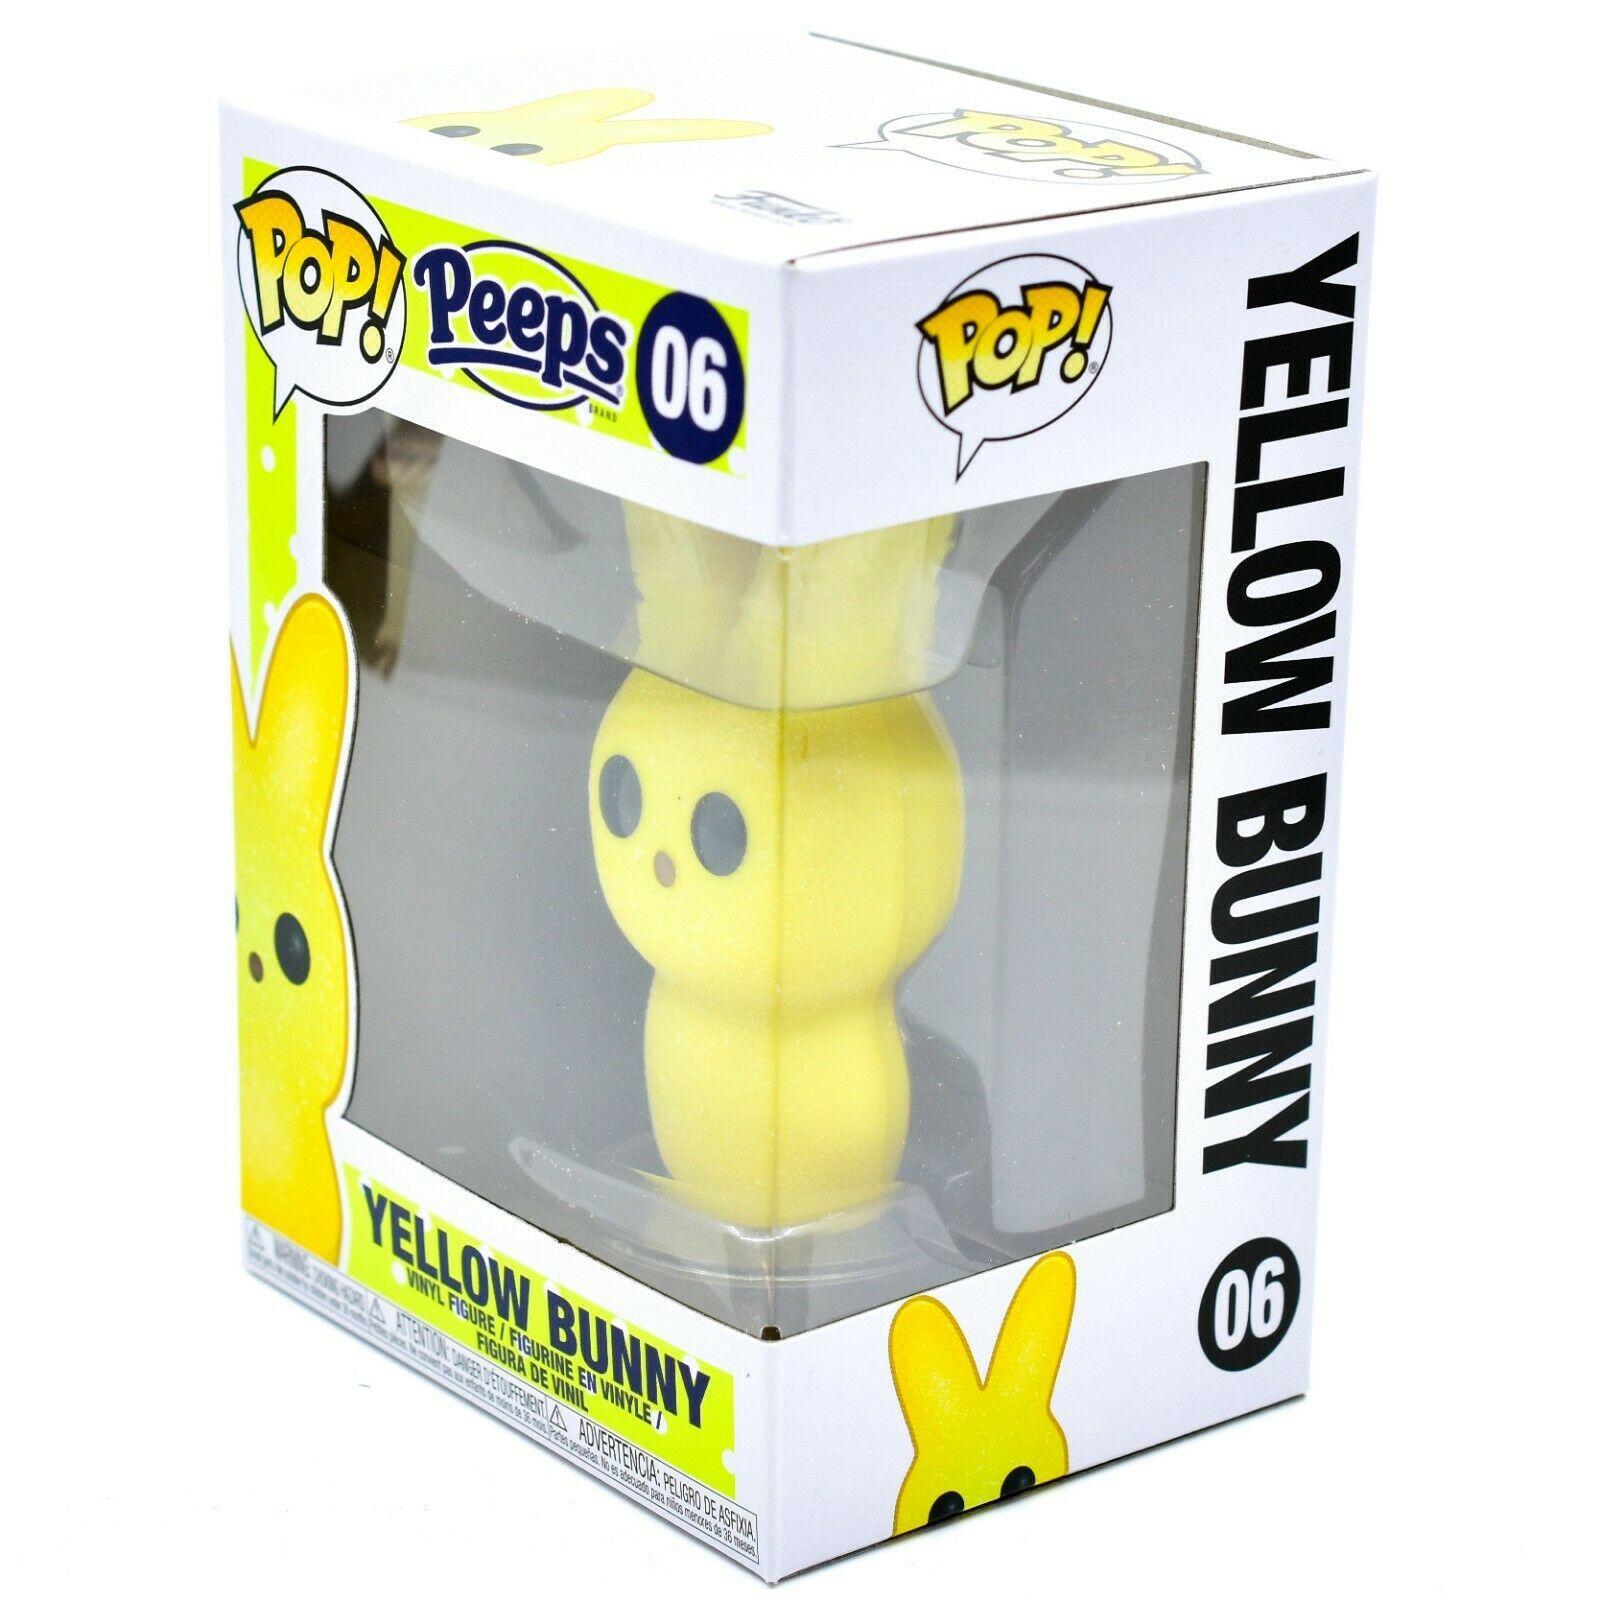 Funko Pop! Peeps Yellow Bunny #06 Easter Candy Theme Vinyl Action Figure